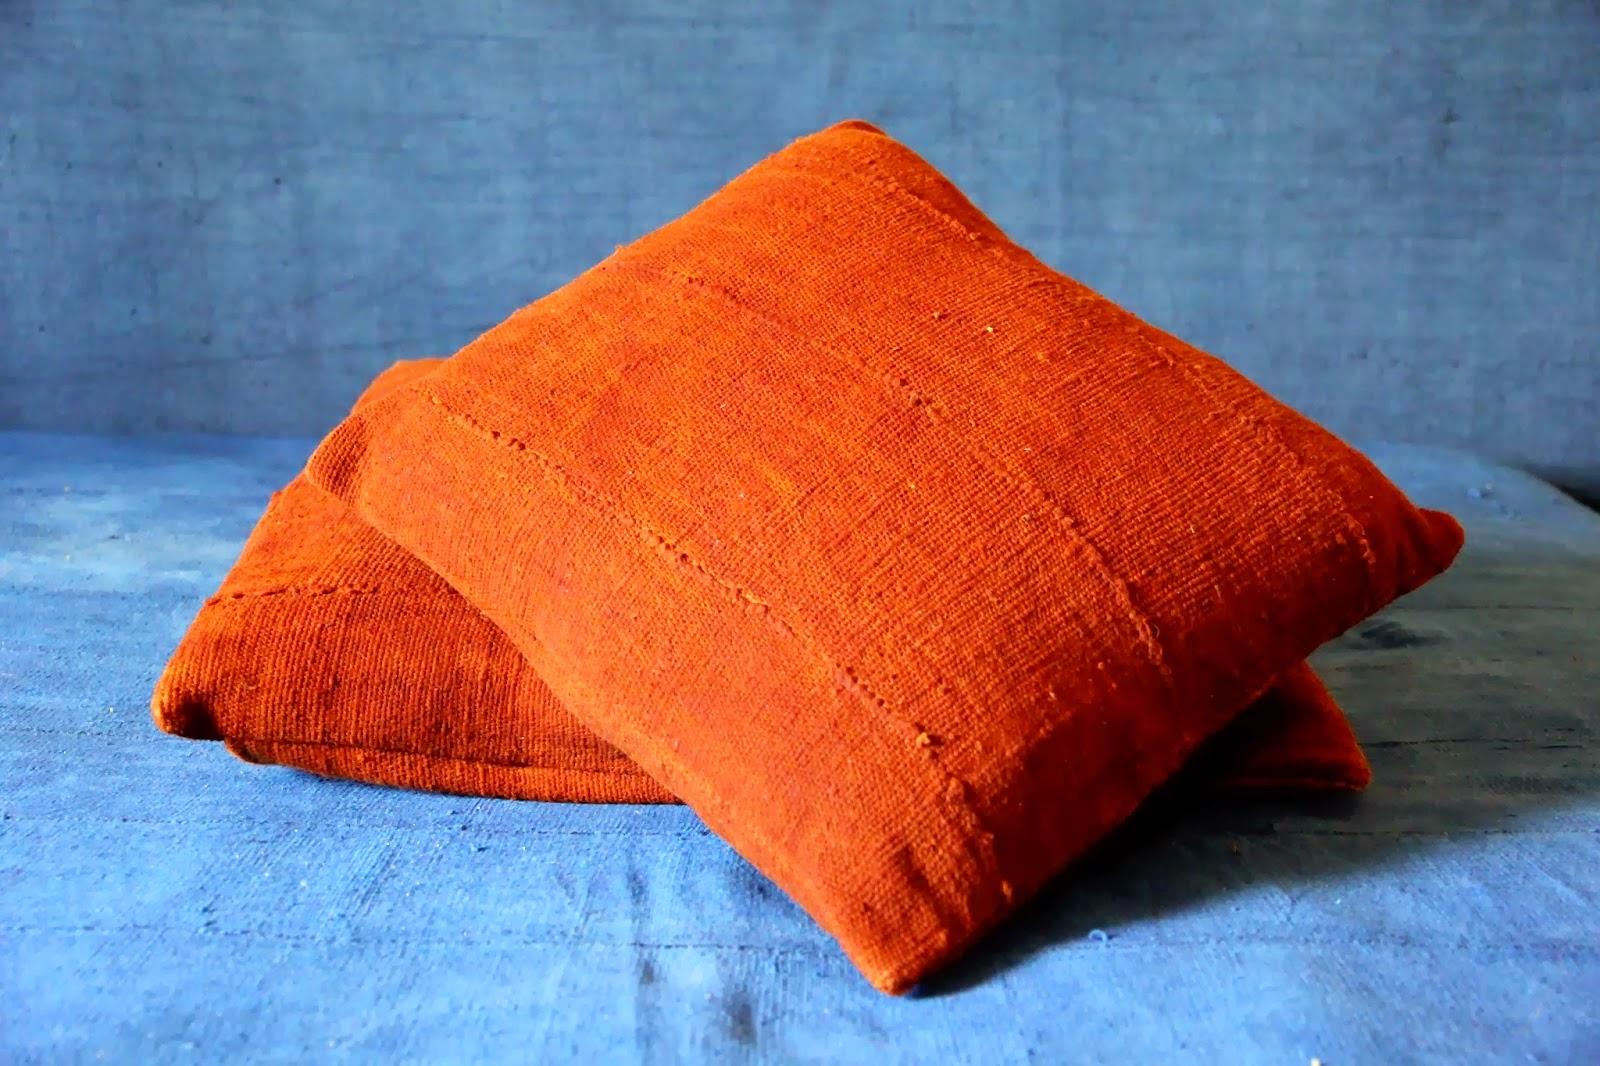 Deco - Textile Malien - Kronbali